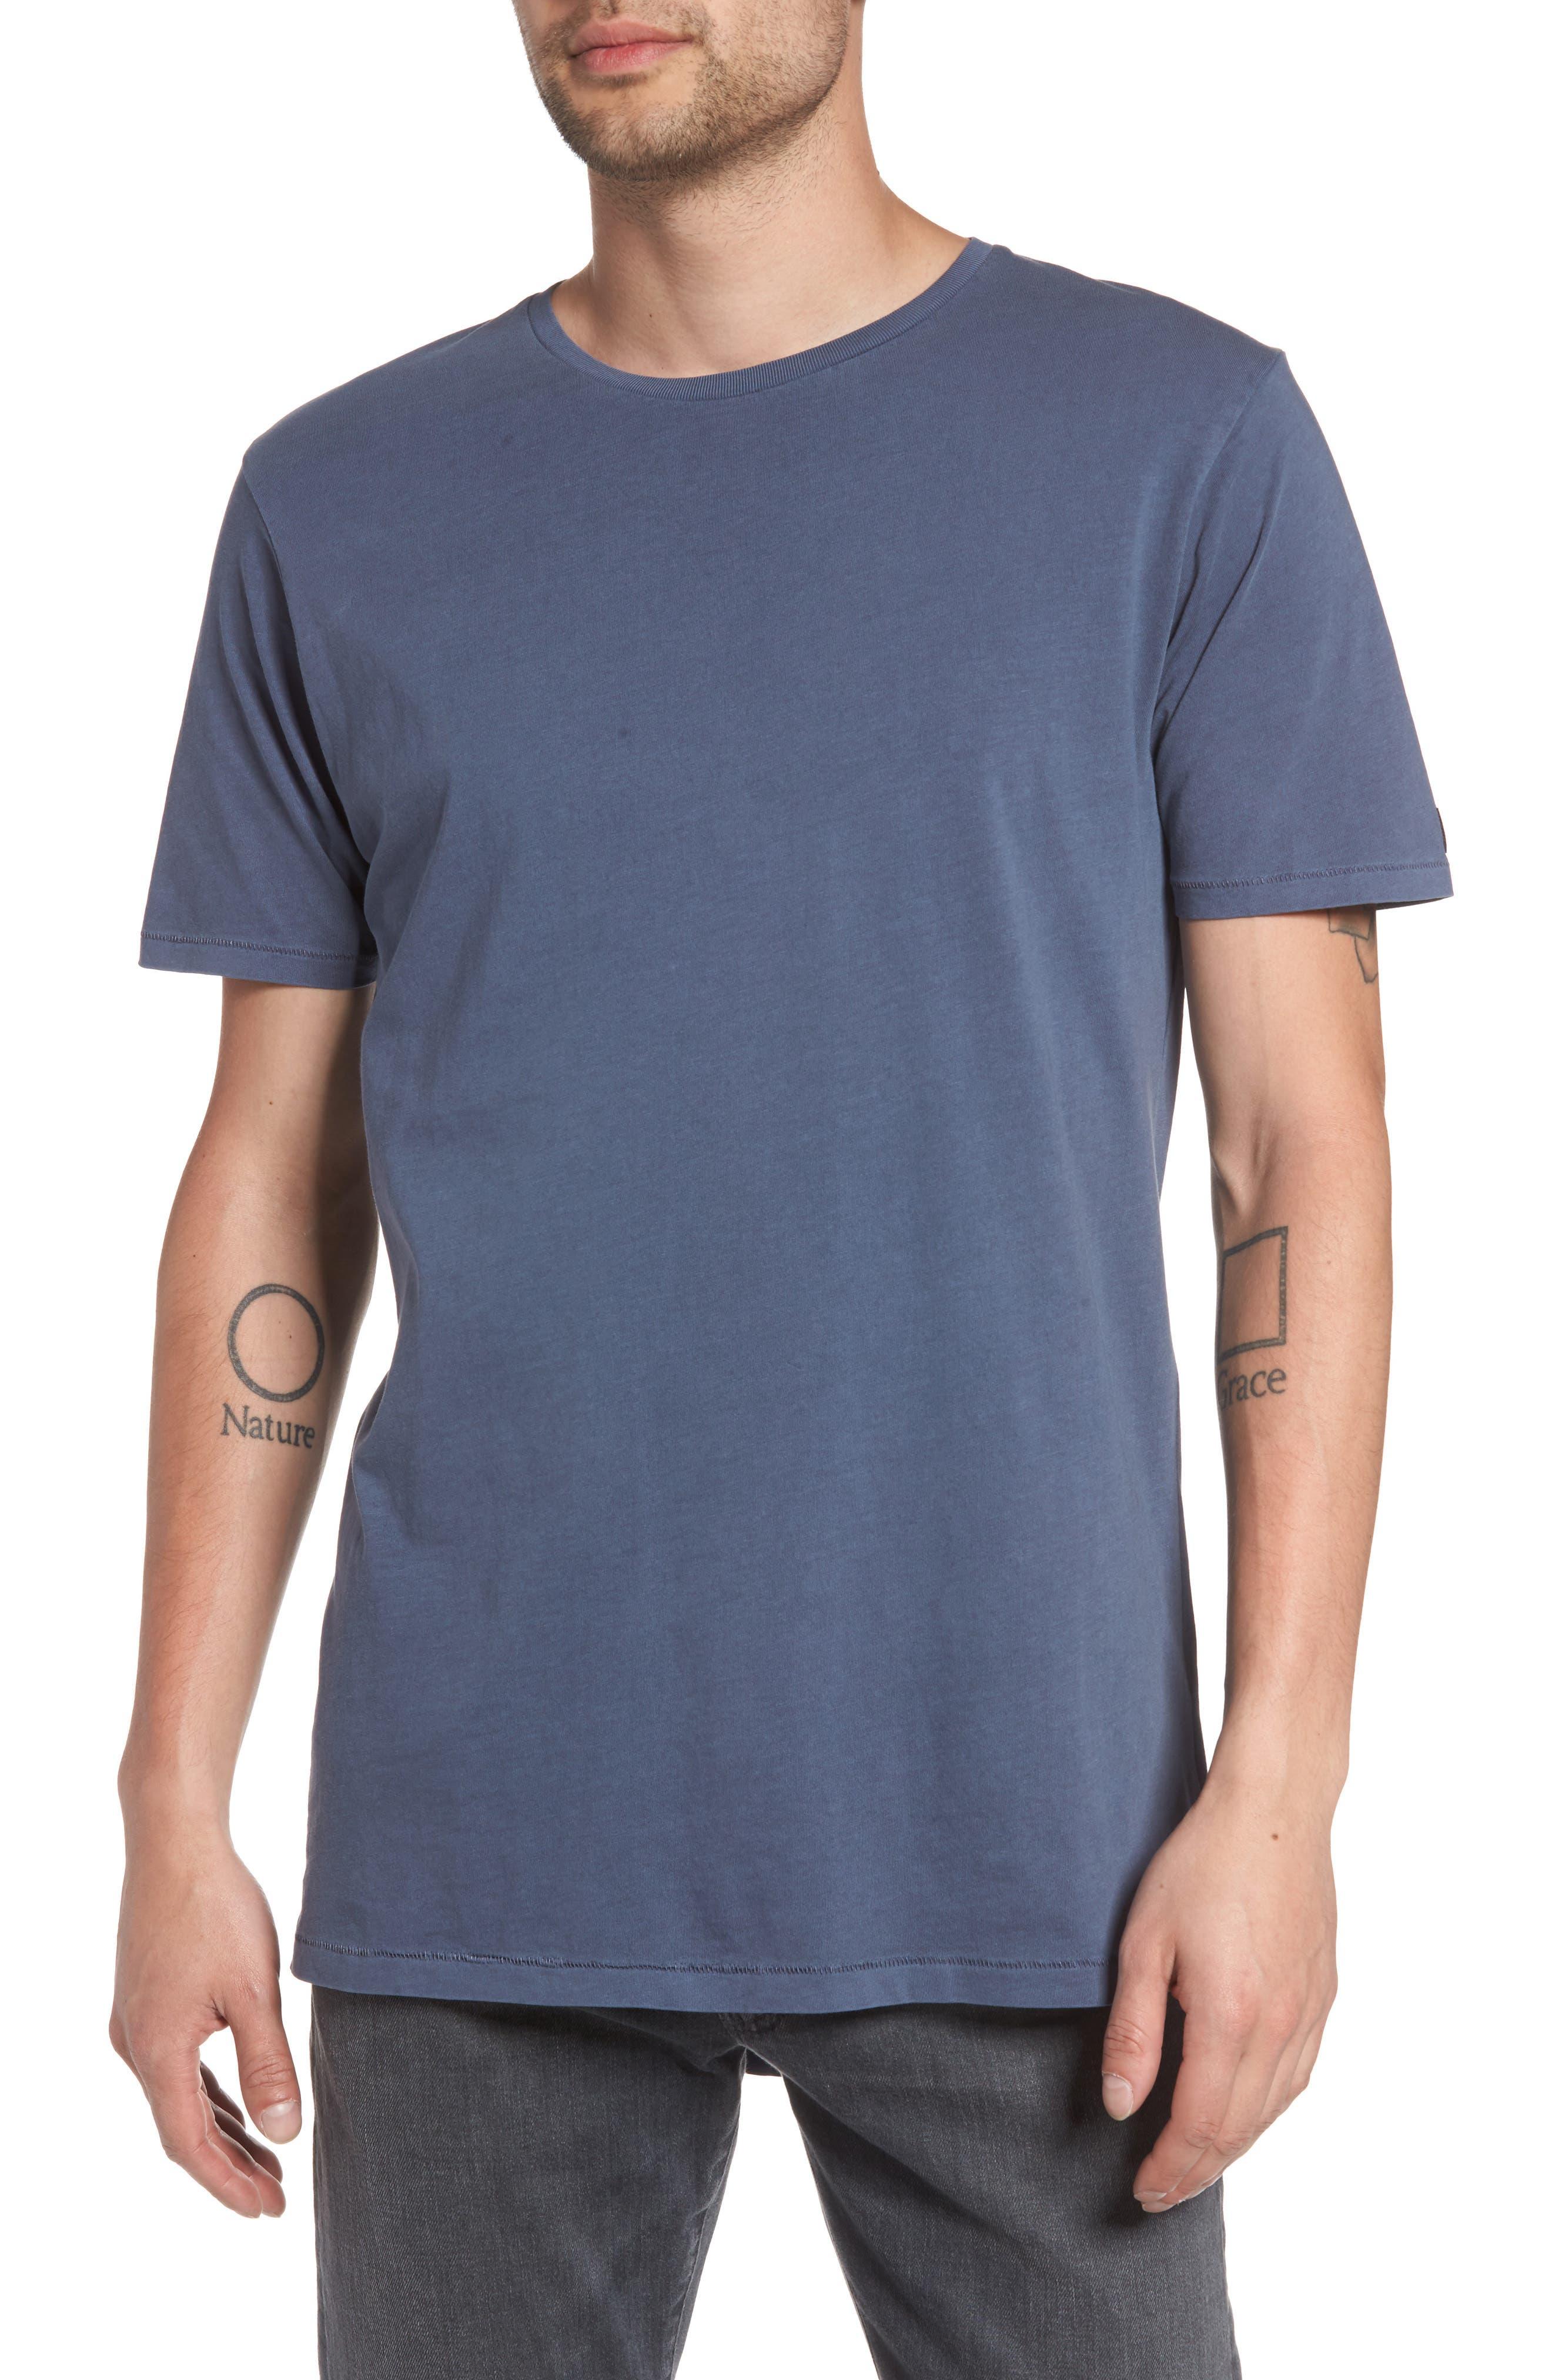 Flintlock Stripe T-Shirt,                             Main thumbnail 1, color,                             Pigment Blue Grey